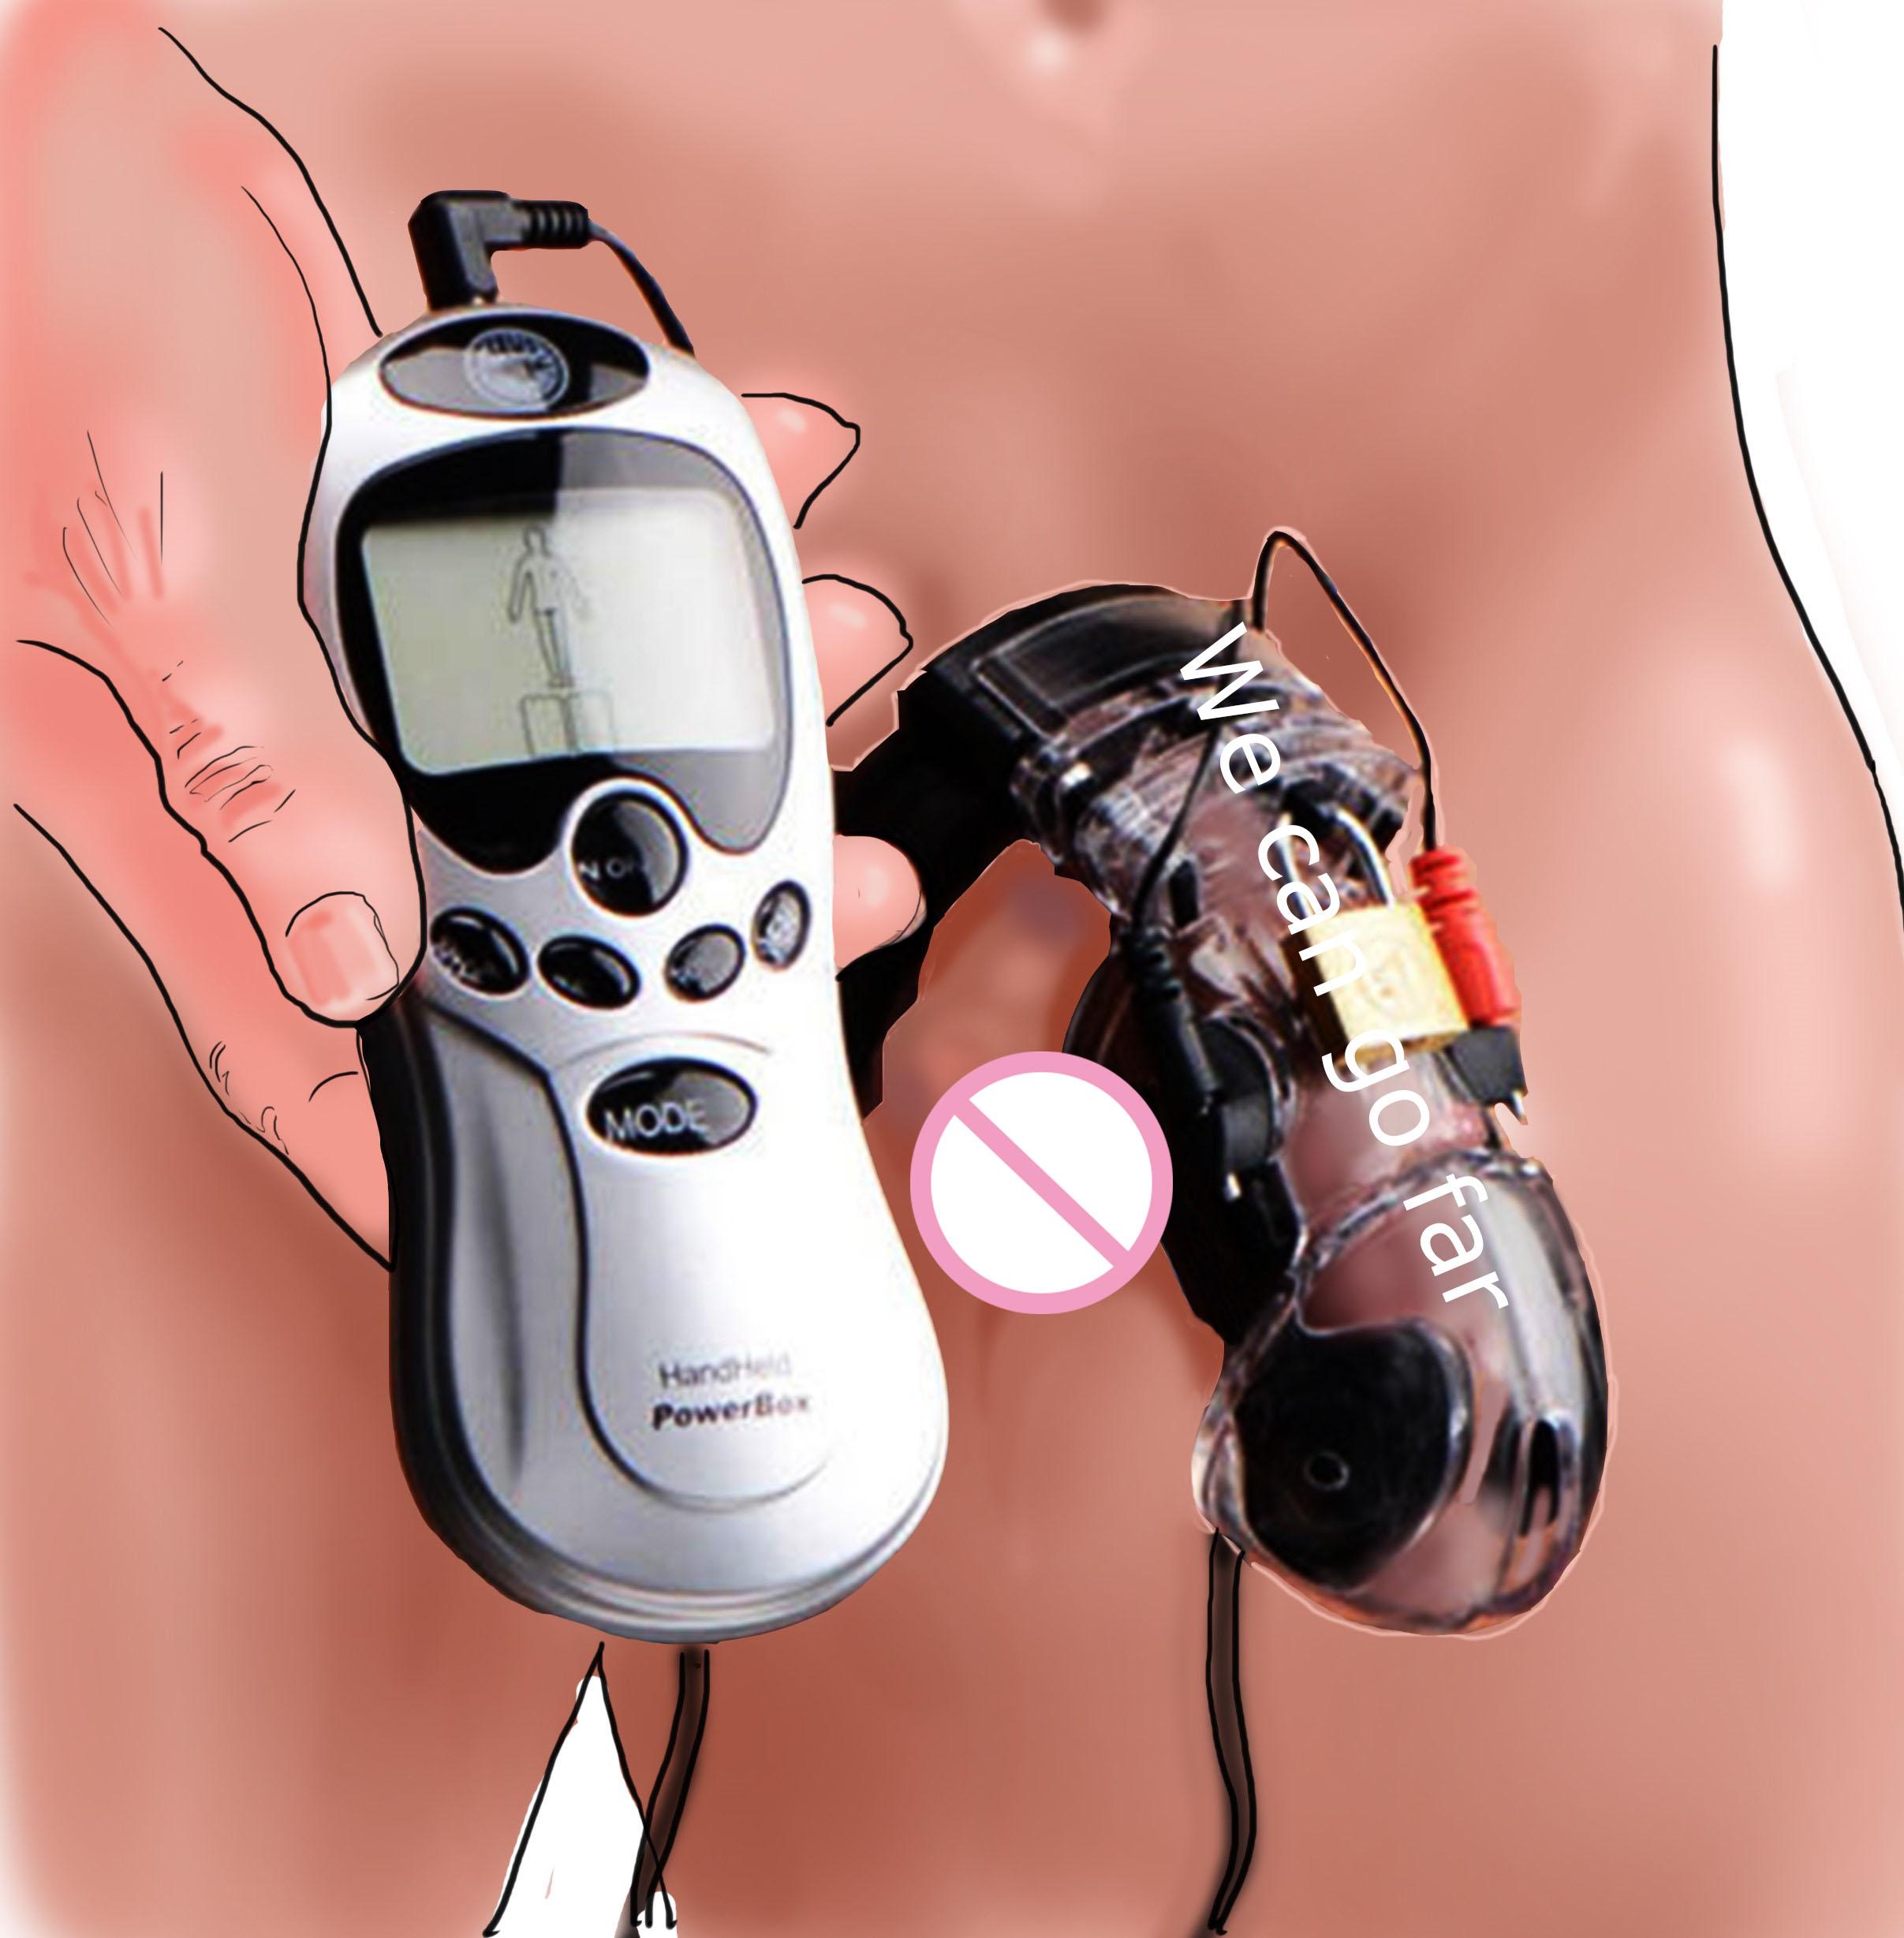 CB6000 Male Chastity Device, Estim Ball Stretcher Scrotum Ring Delay Lock,Electro Shock Cock Cage Sex Toys For Men